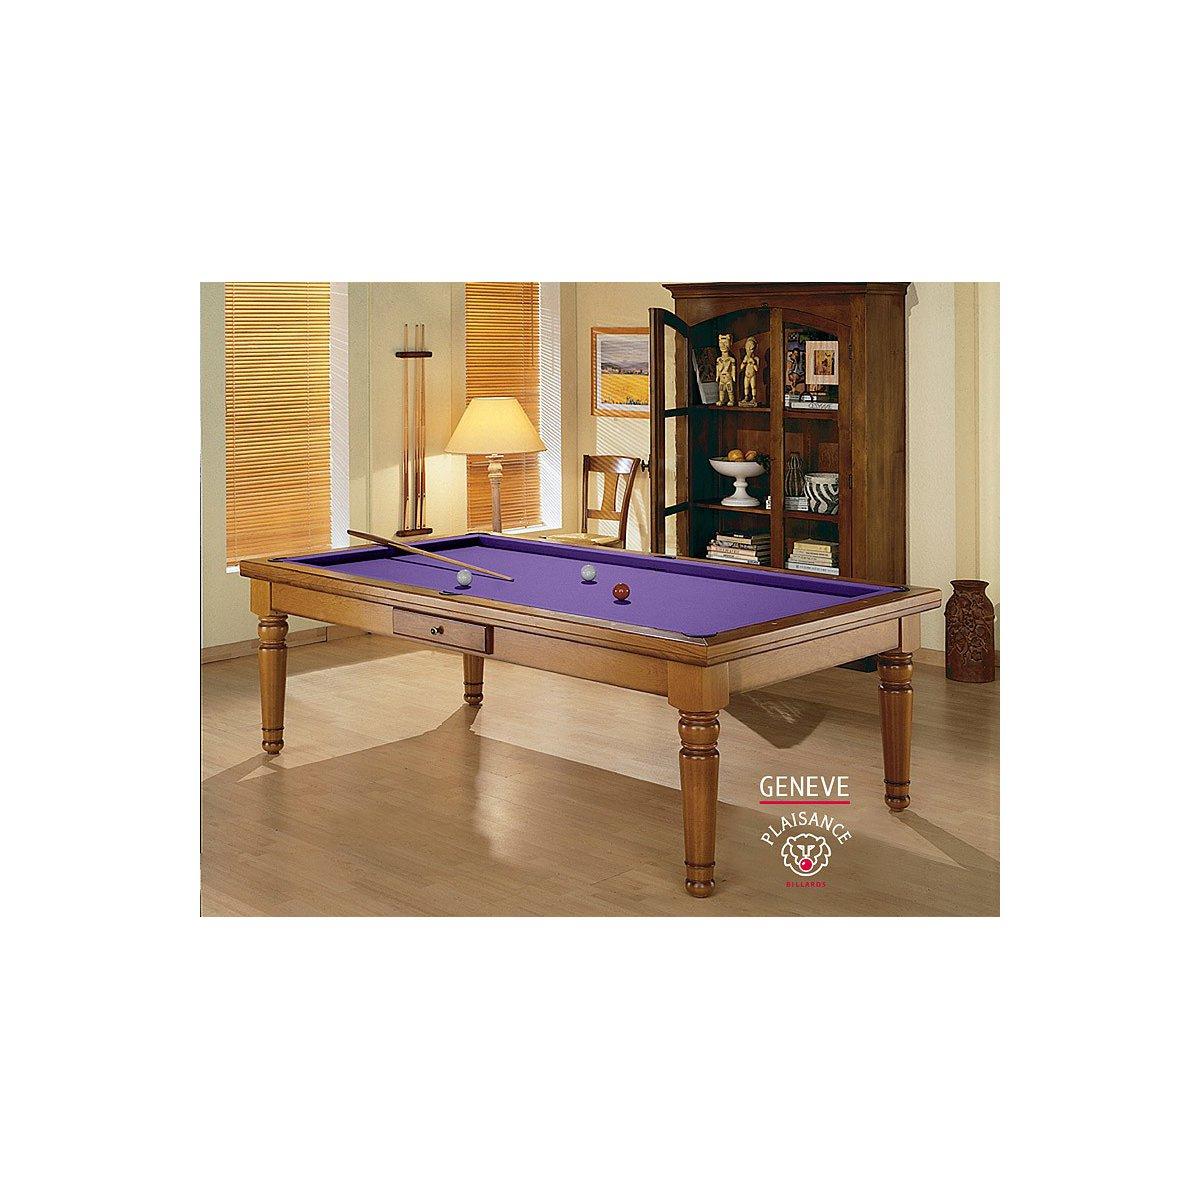 table billard convertible gen ve billard de luxe. Black Bedroom Furniture Sets. Home Design Ideas